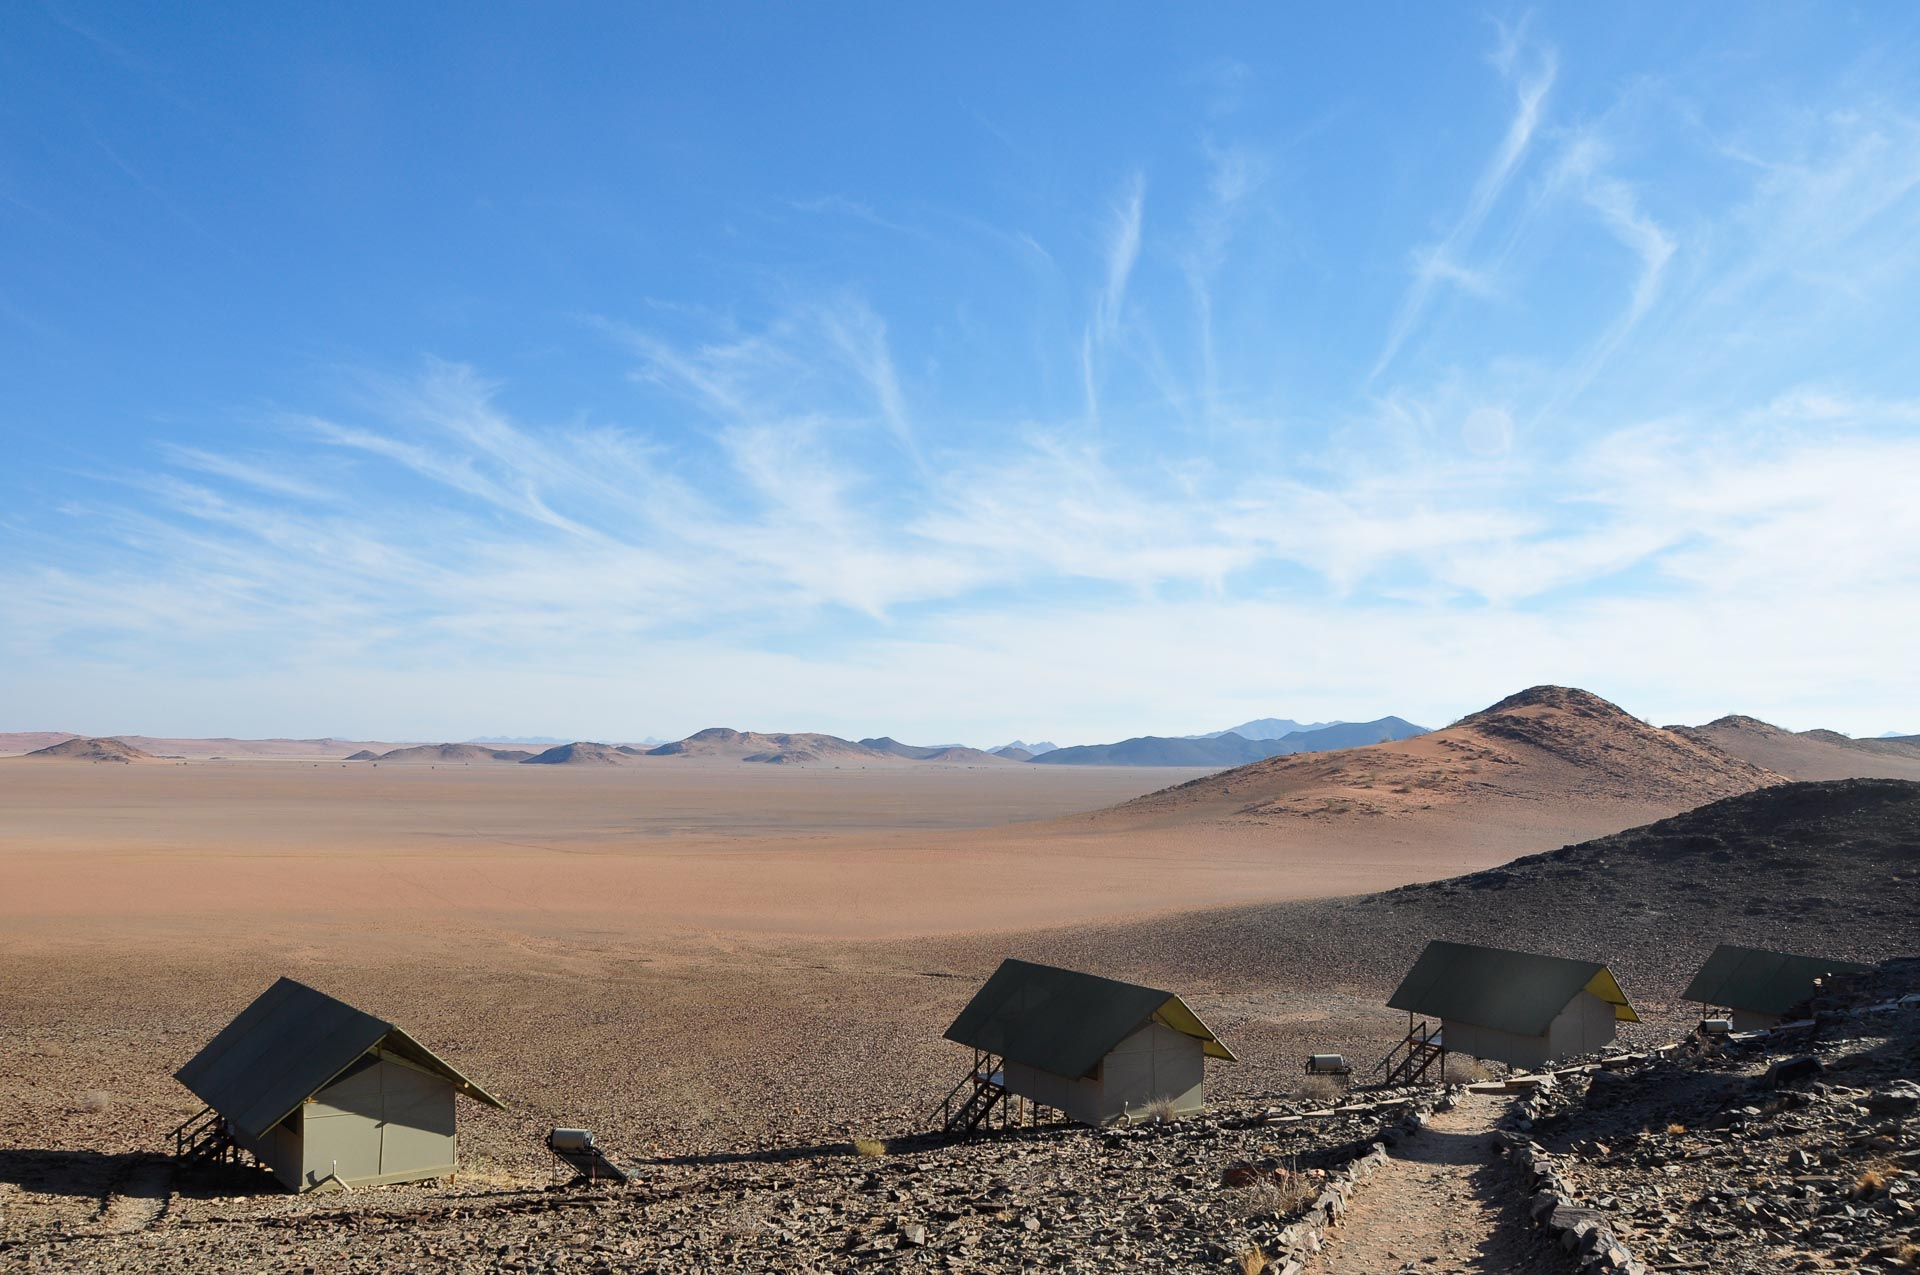 Kanaan-Desert-Retreat-Namibia-Globetrotter-Select-42